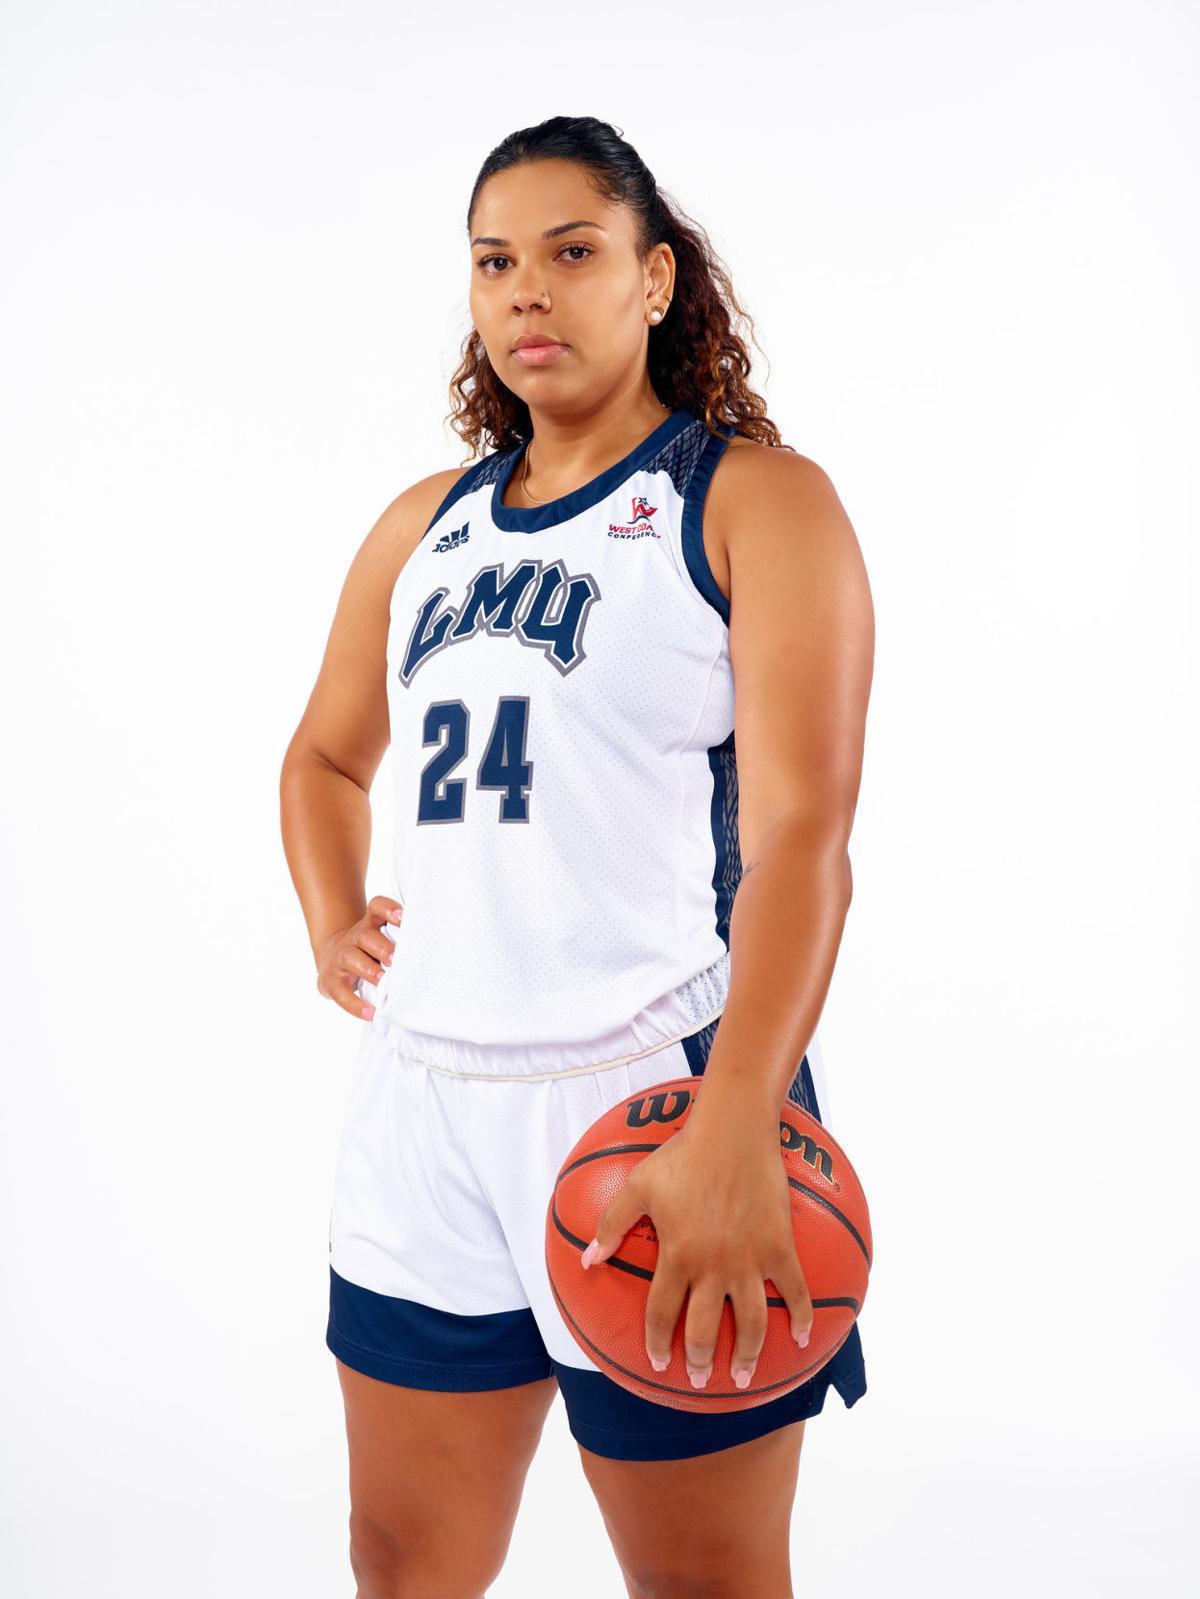 Women Womens Women's Basketball Media Day Portrait 2018 Photo shoot